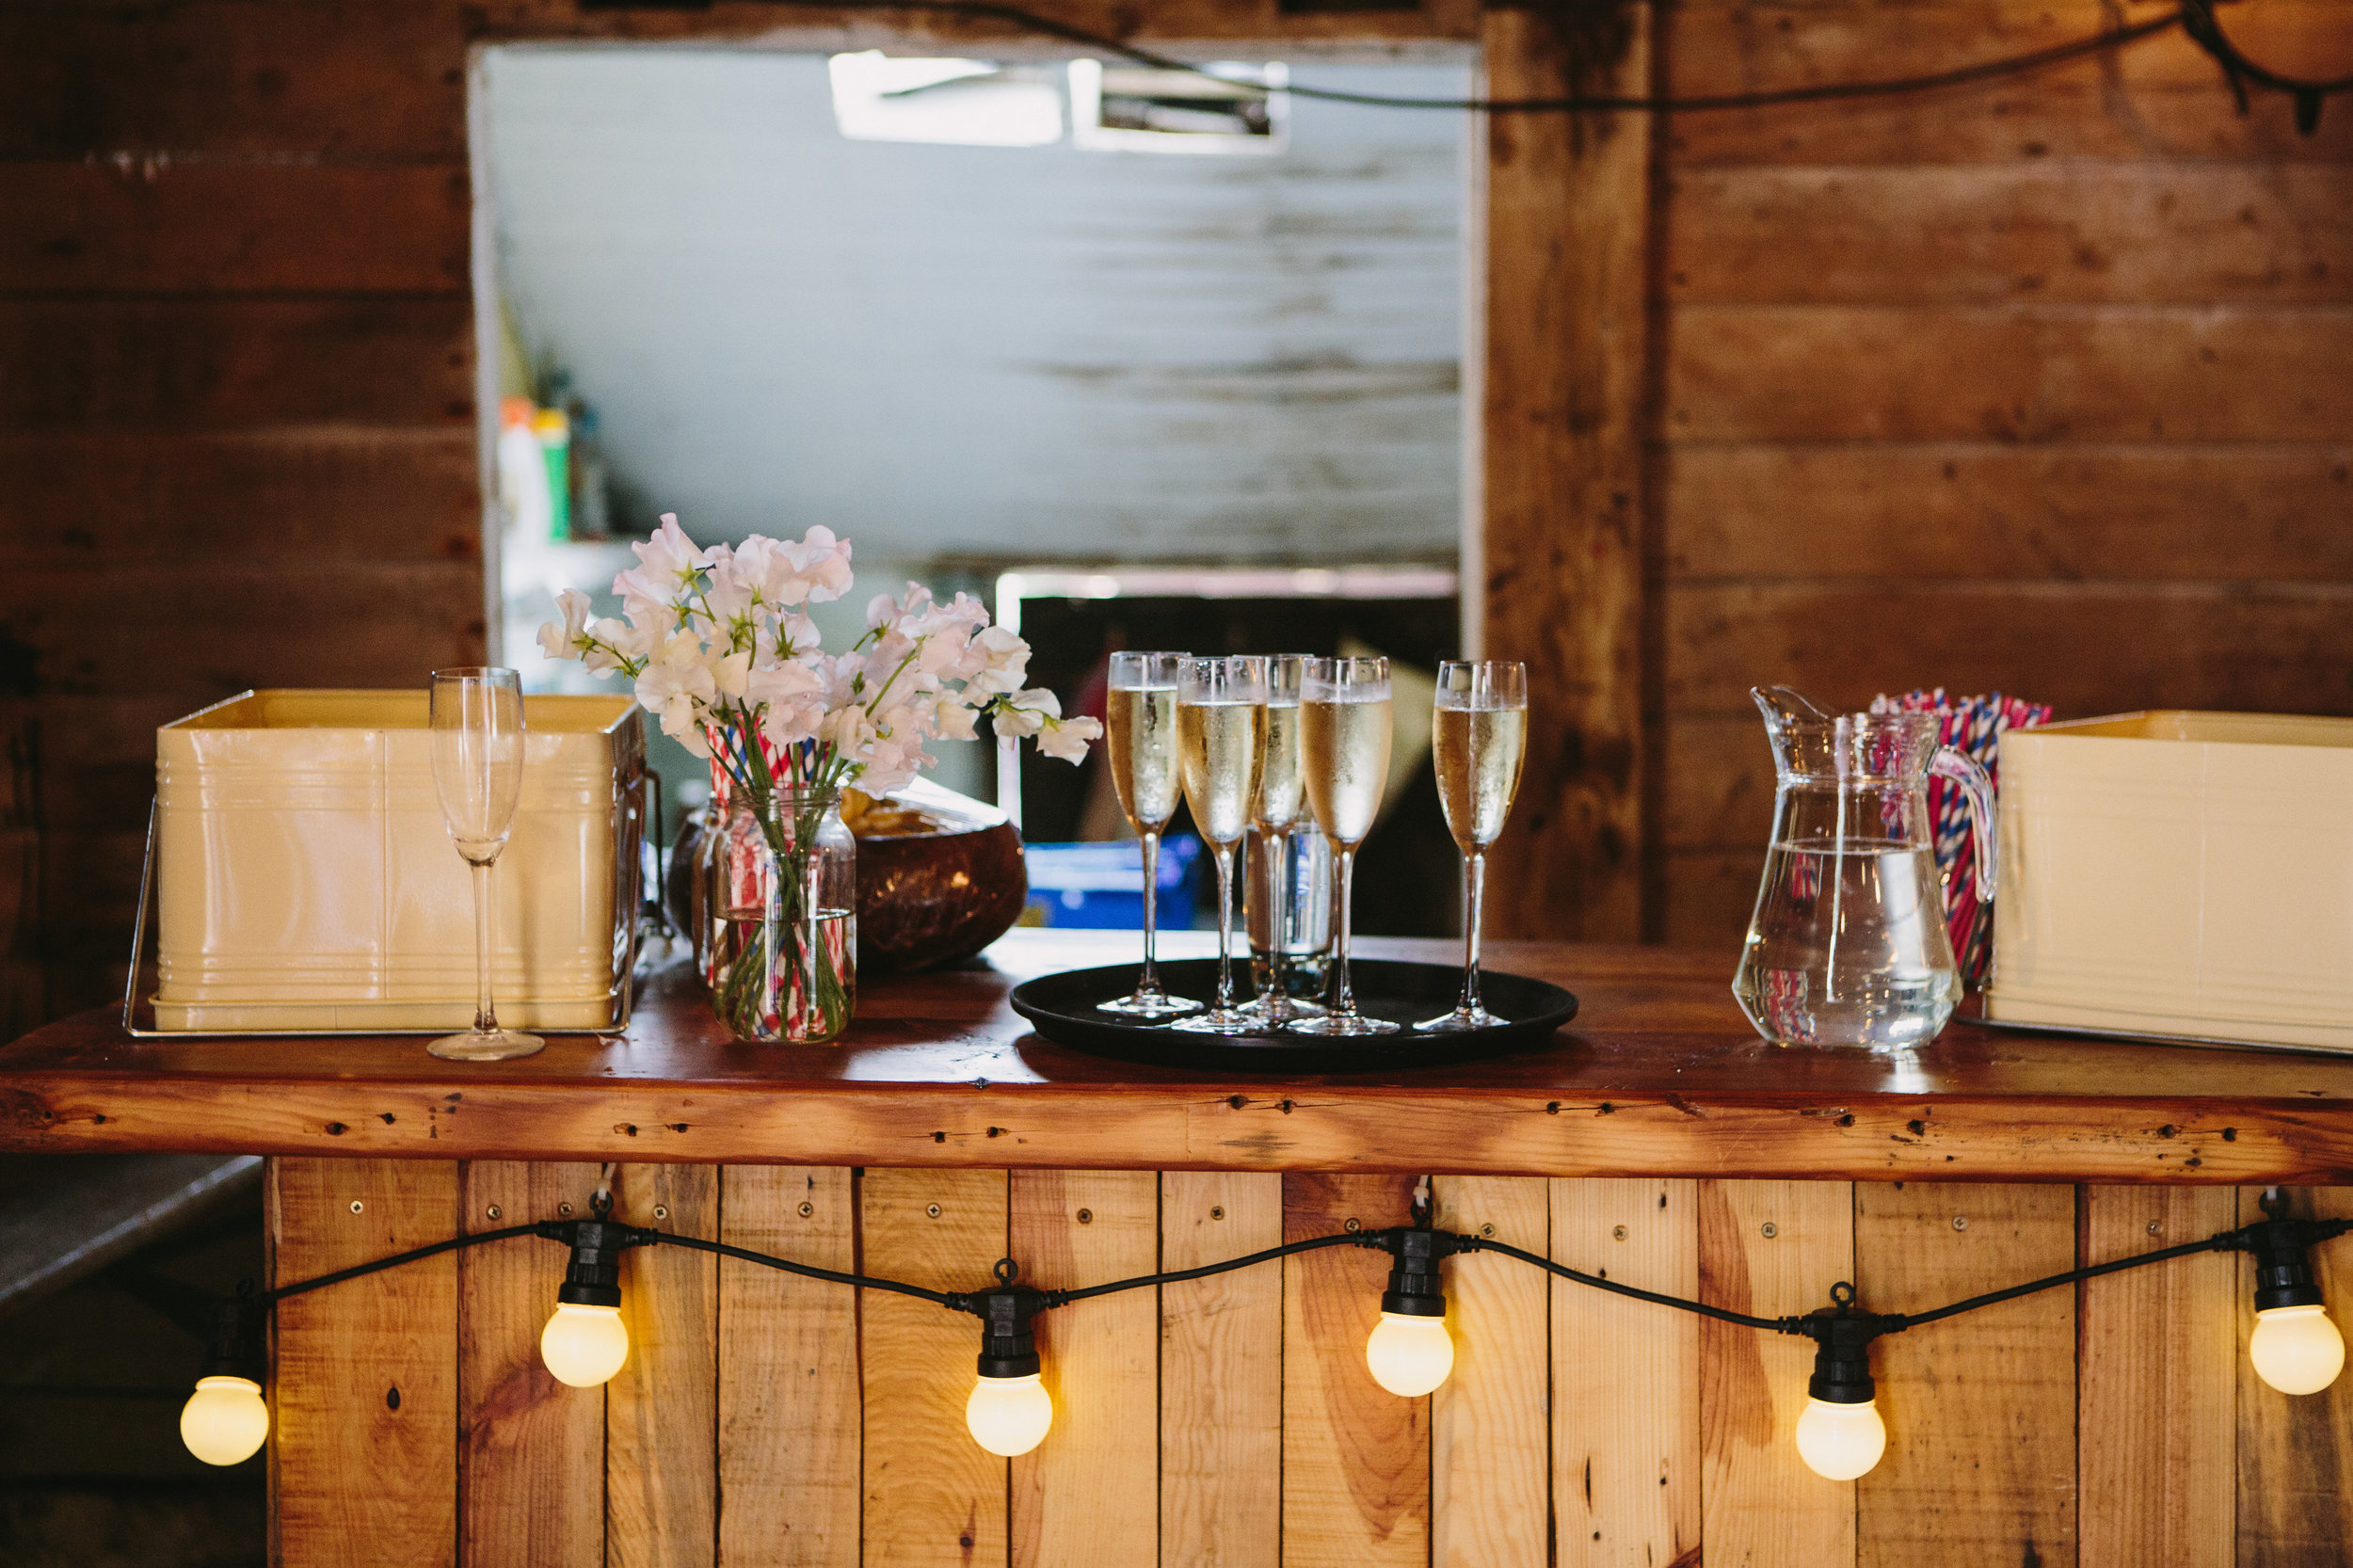 drinks-on-bar.jpg